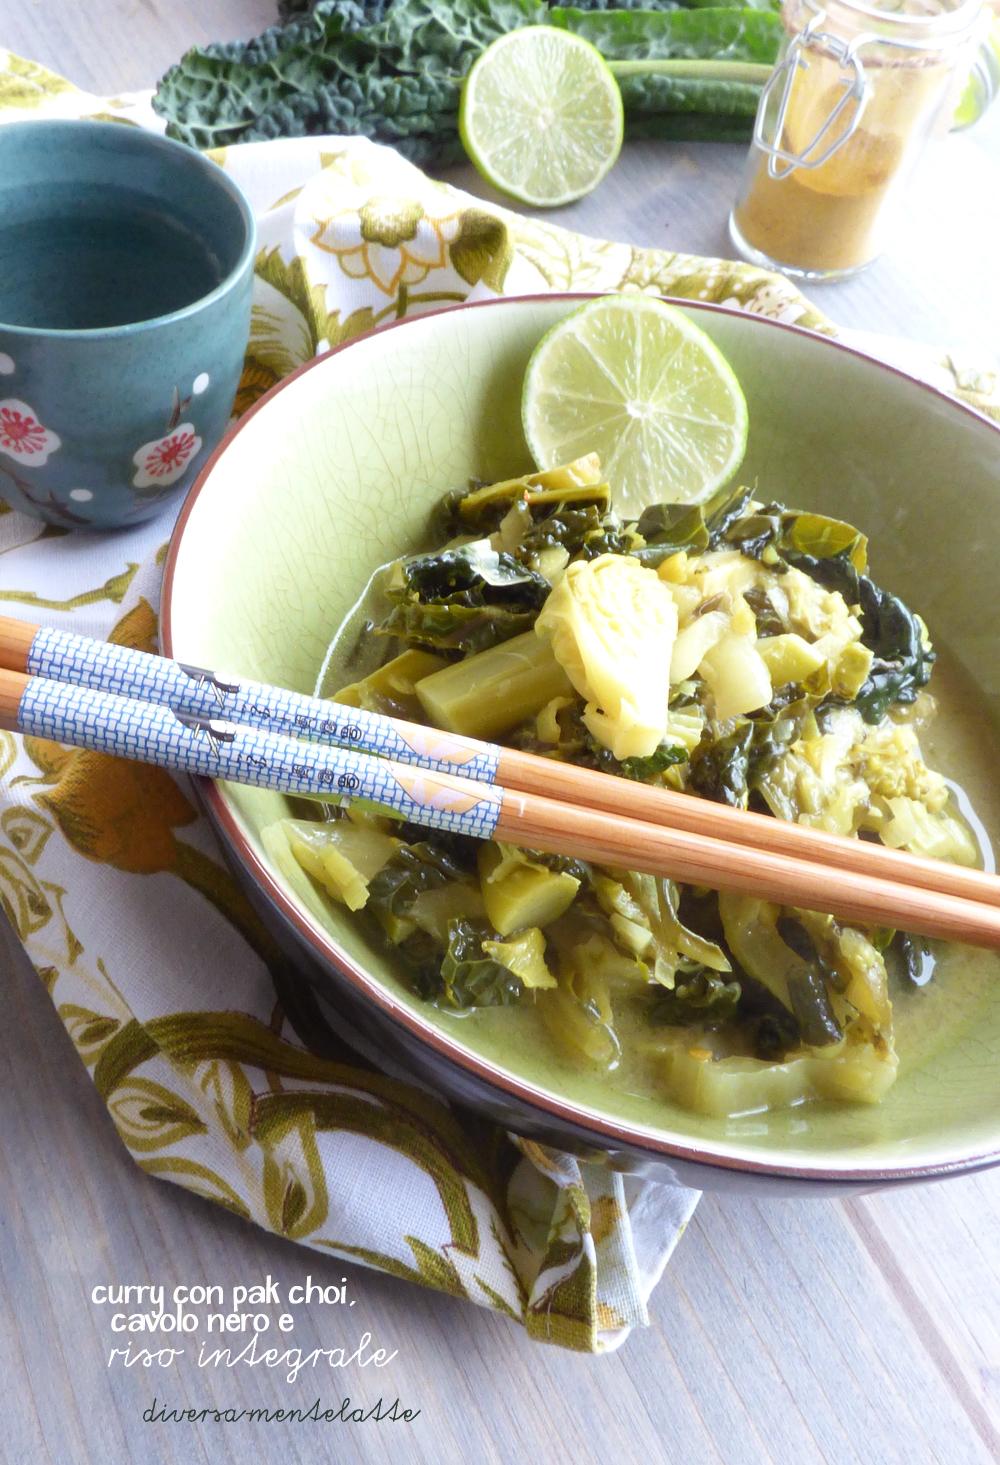 curry con pak choi